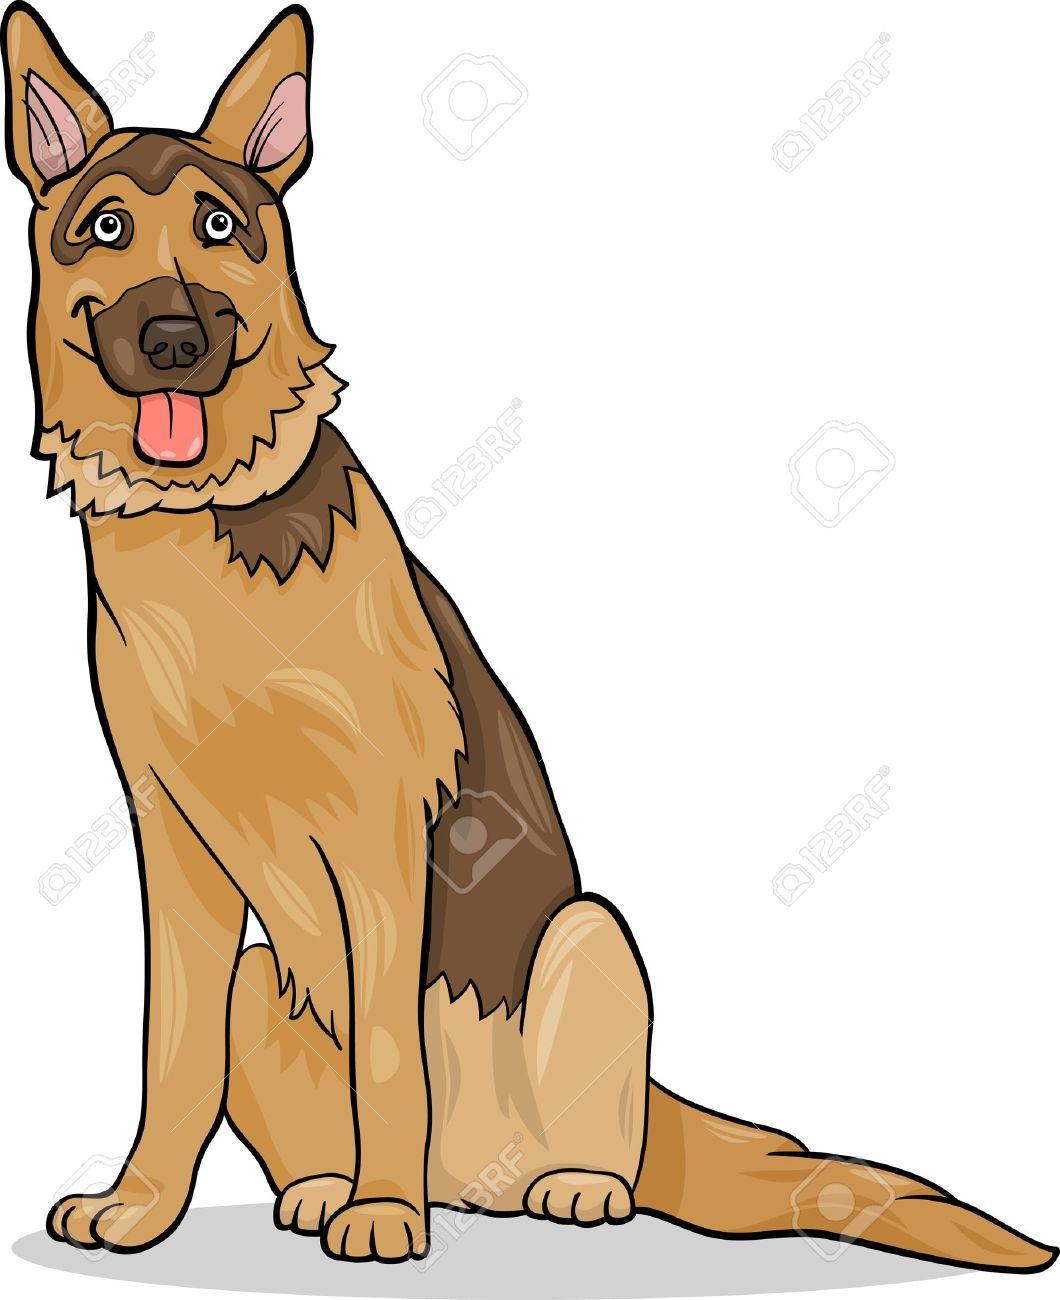 Cartoon Illustration Of Funny German Shepherd Purebred Dog Royalty.